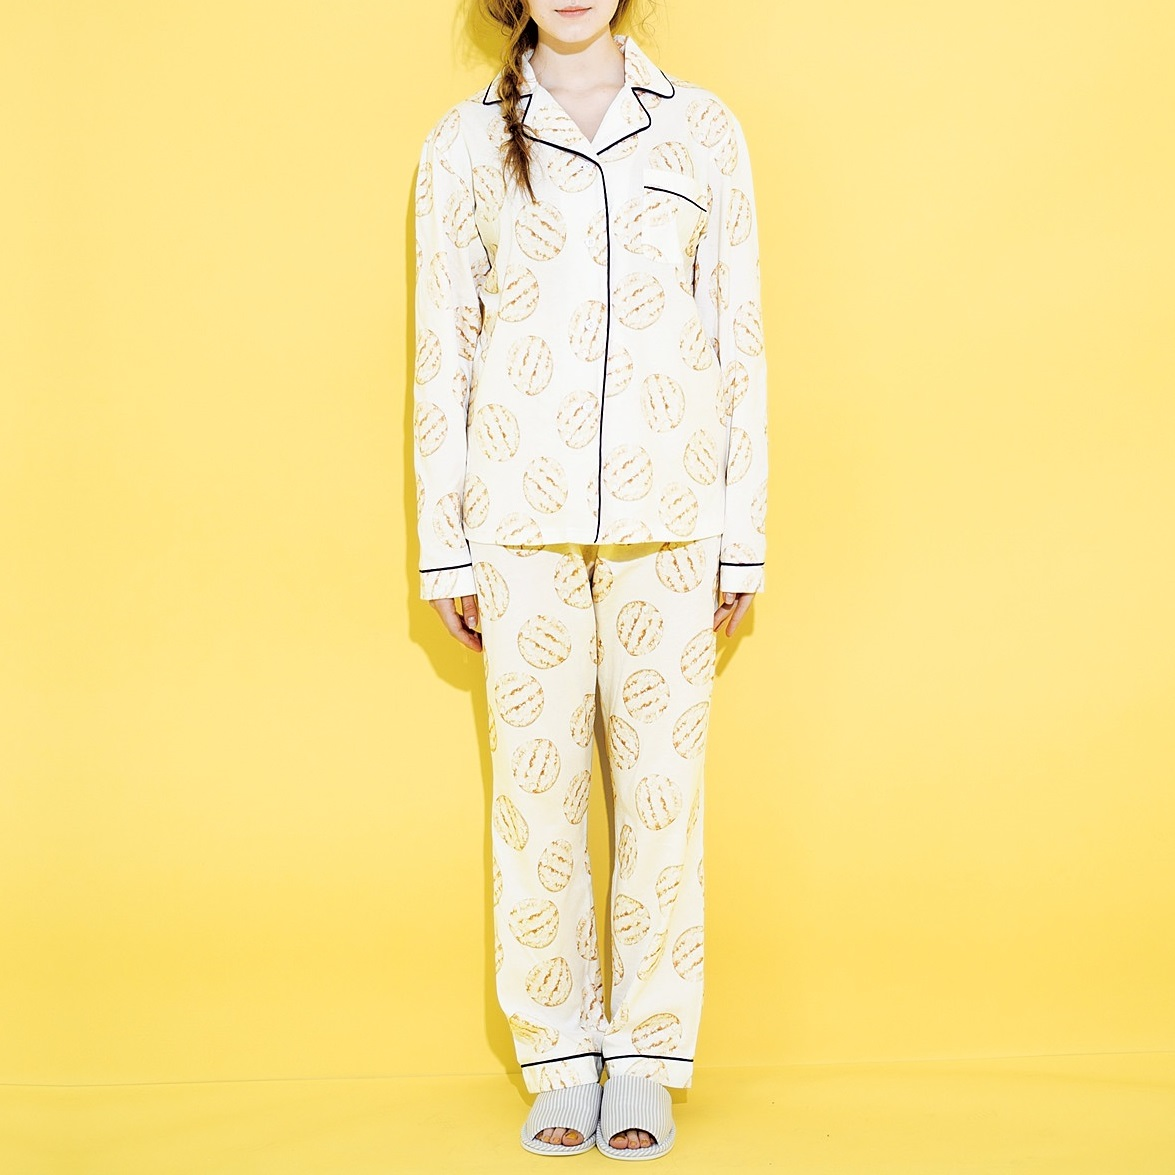 Kraso[クラソ] YOU+MORE! 雪の宿パジャマ〈レディース〉